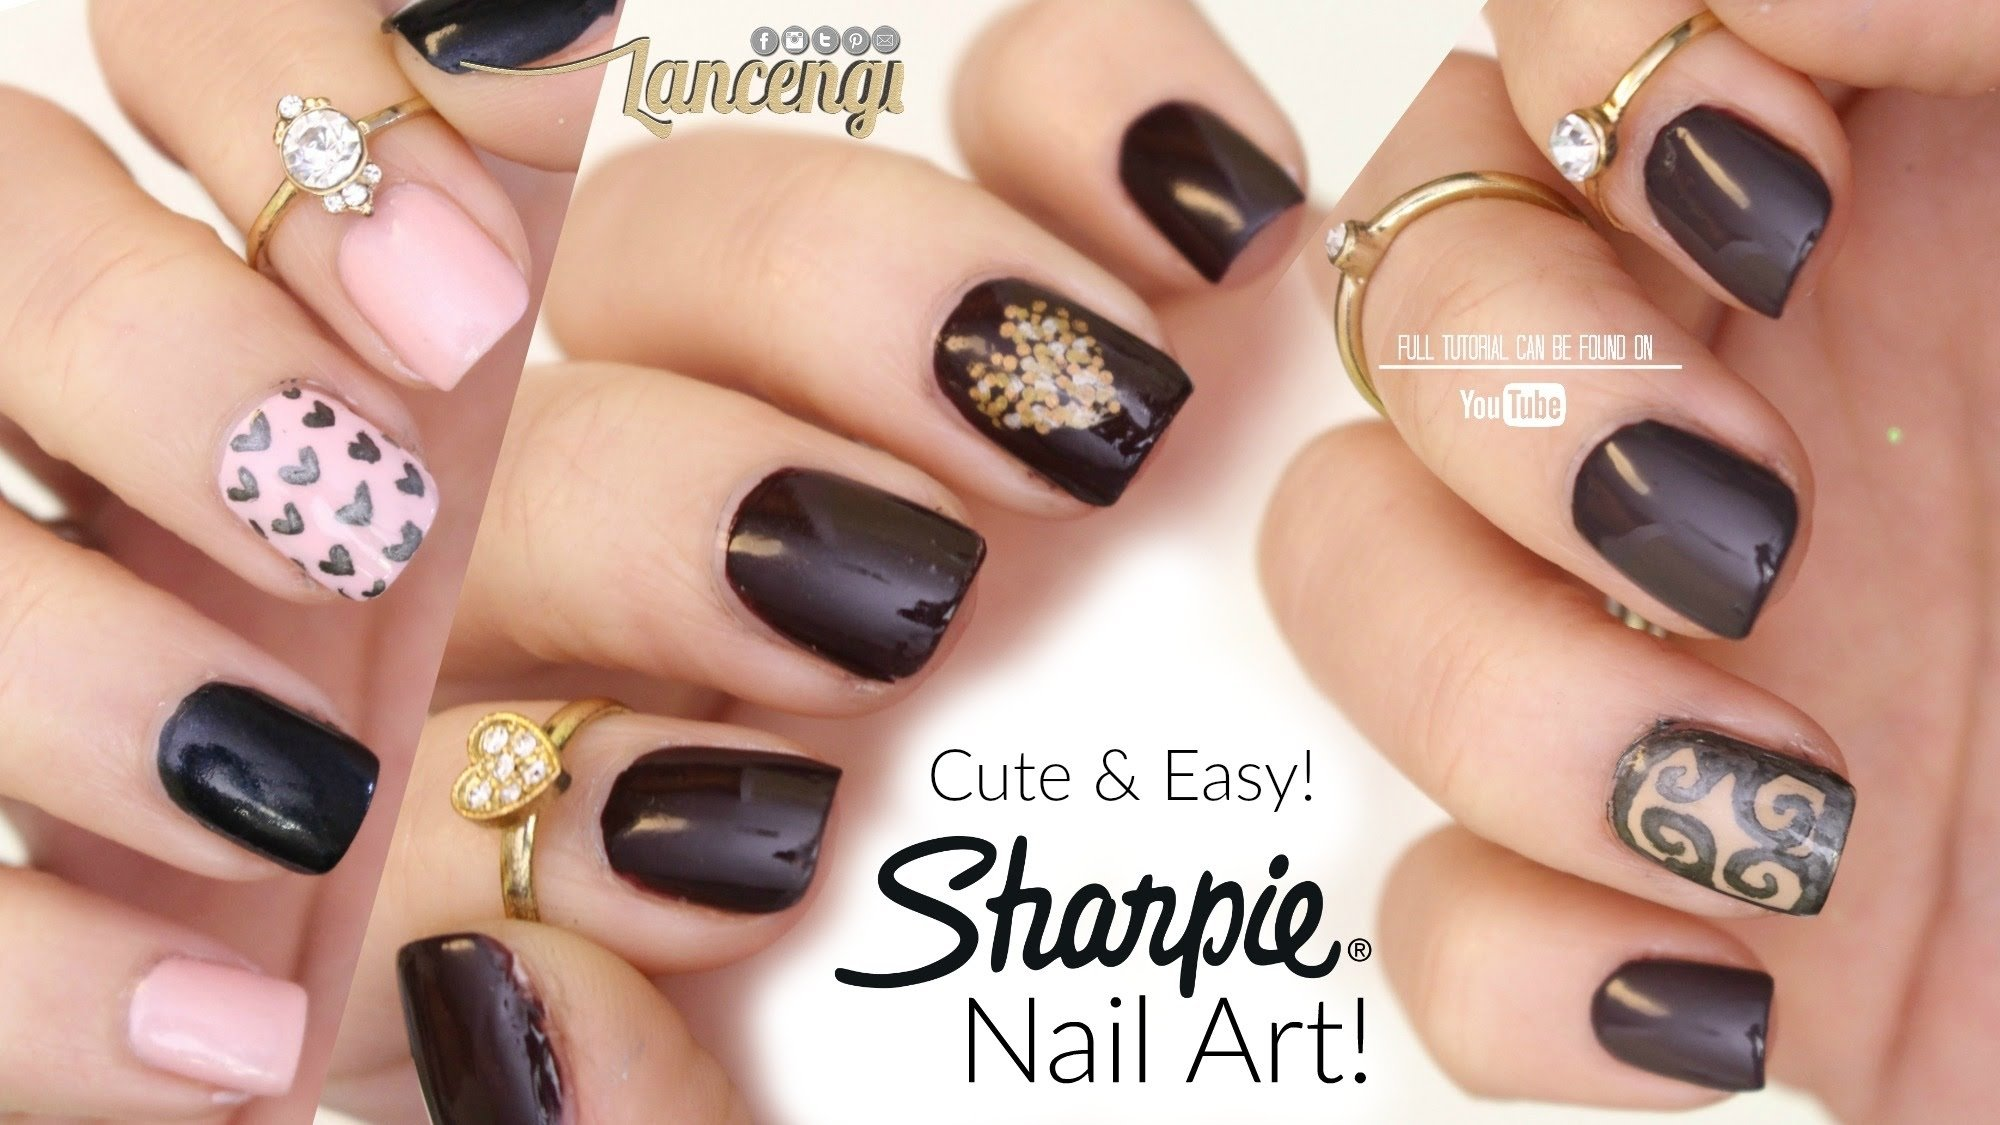 diy cute & easy nail art for beginners - sharpie nail designs #40